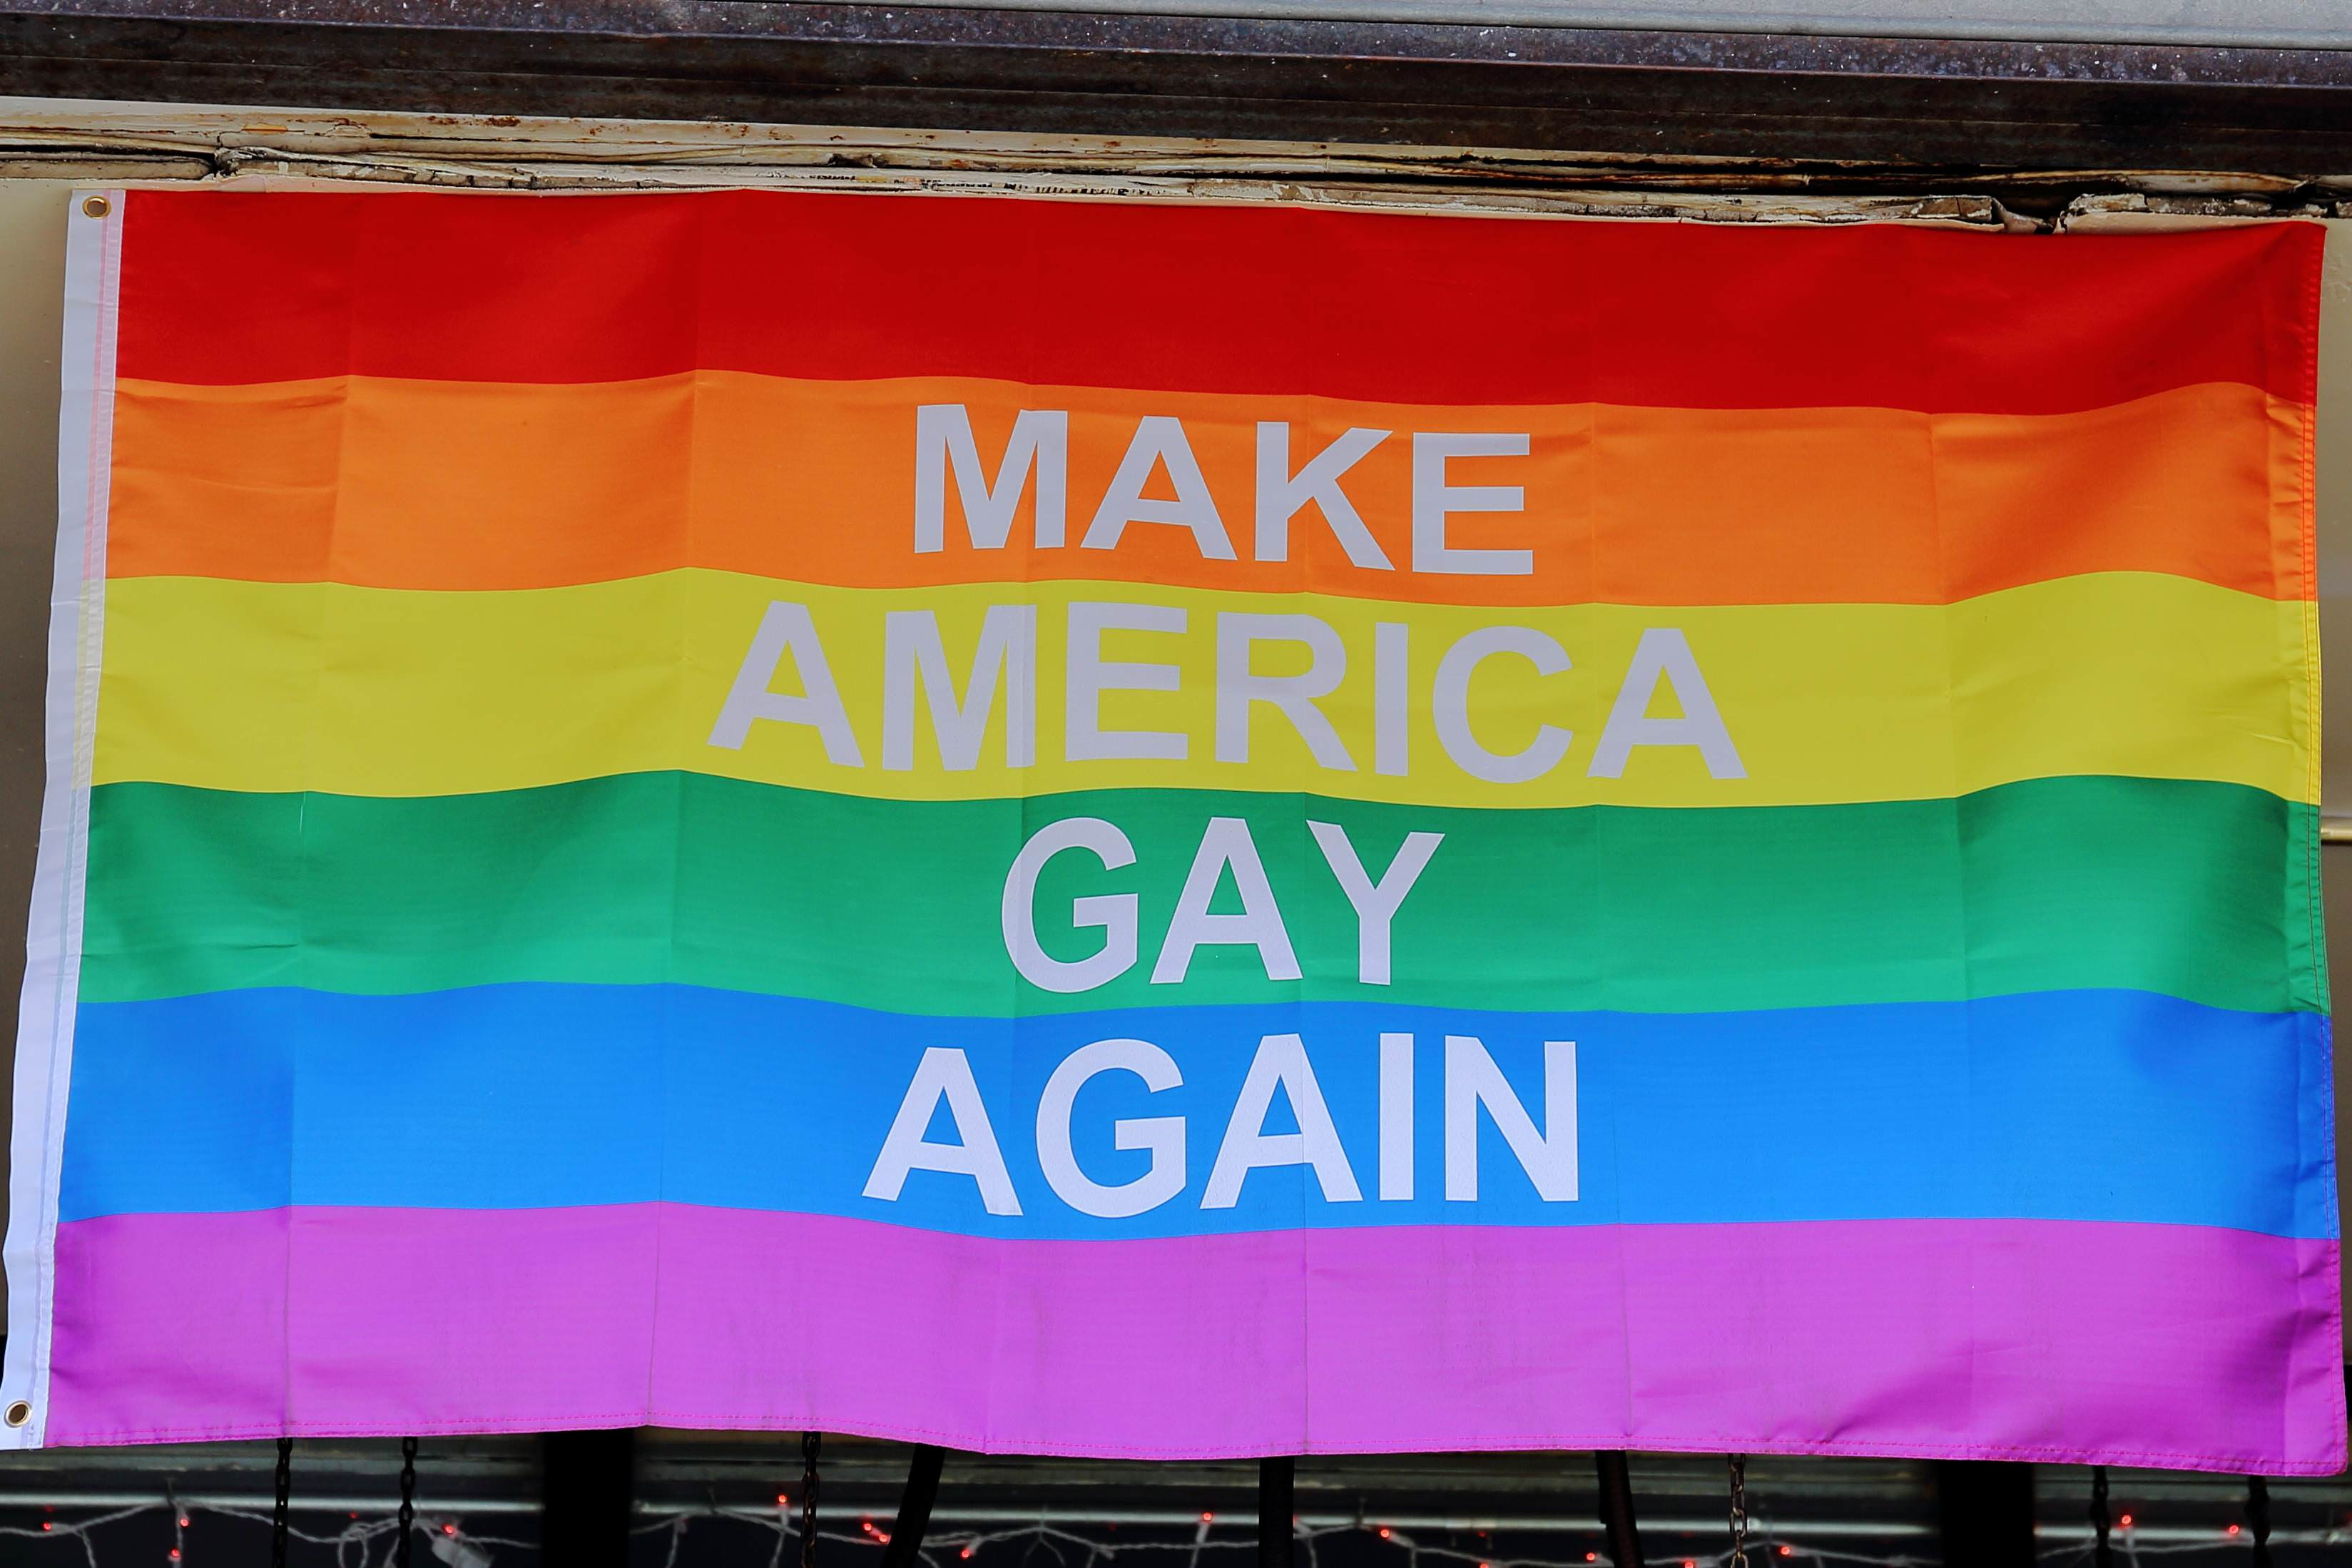 MAKE AMERICA GAY AGAIN 讓美國再次GAY